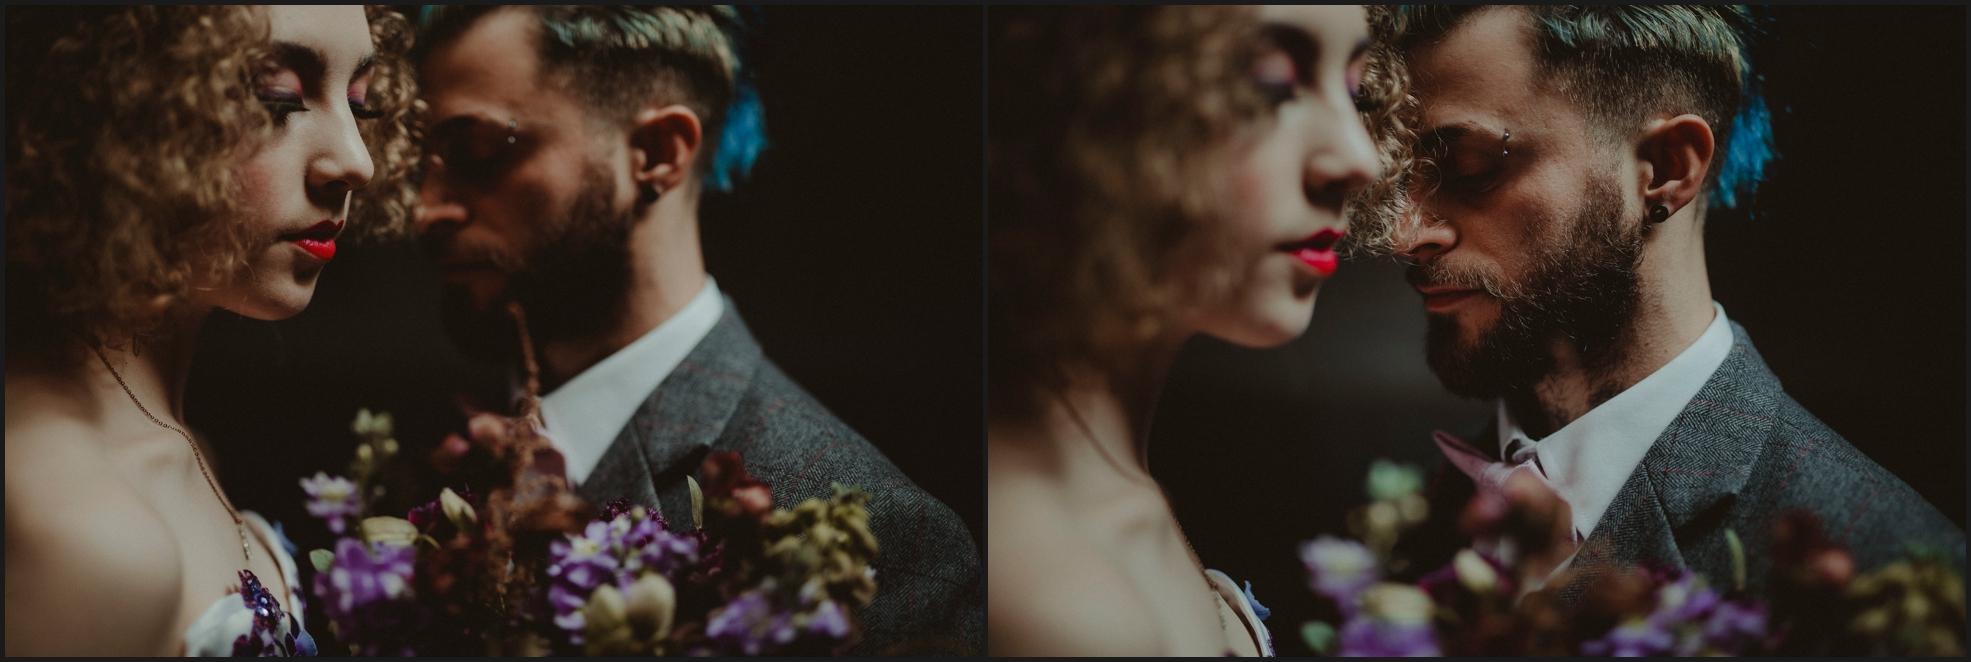 bride, groom, wedding portrait, steampunk, London